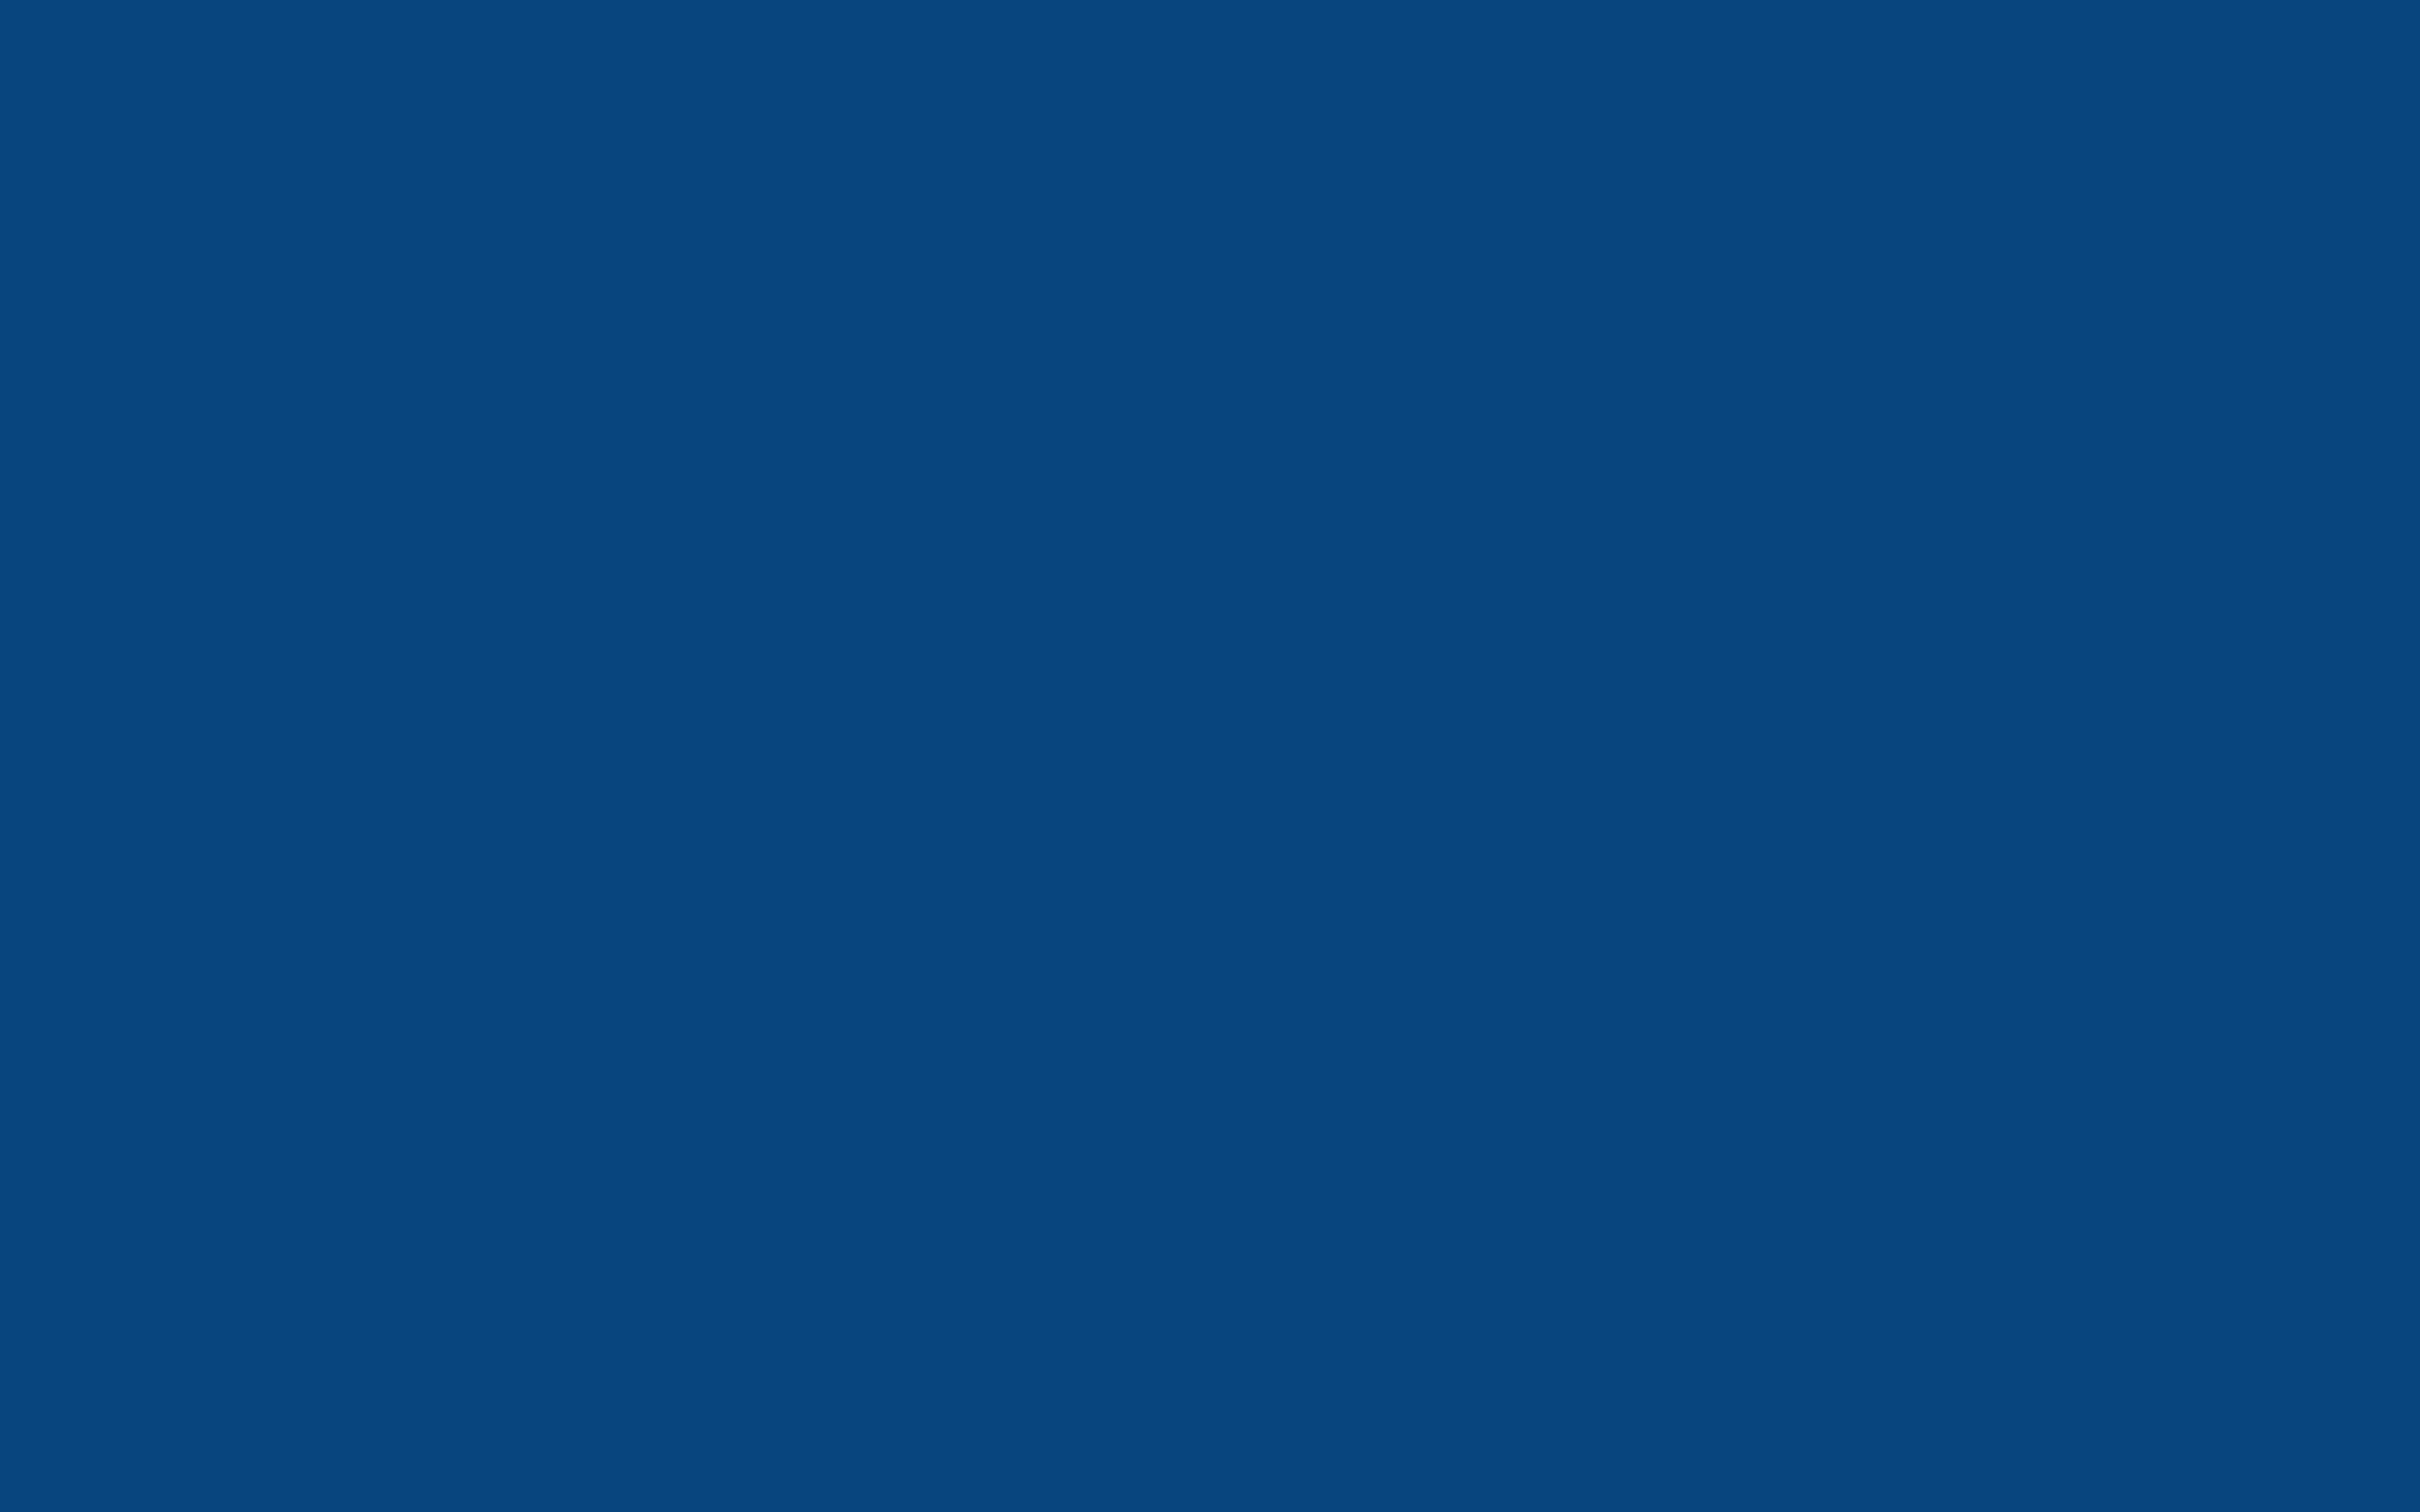 2560x1600 Dark Cerulean Solid Color Background